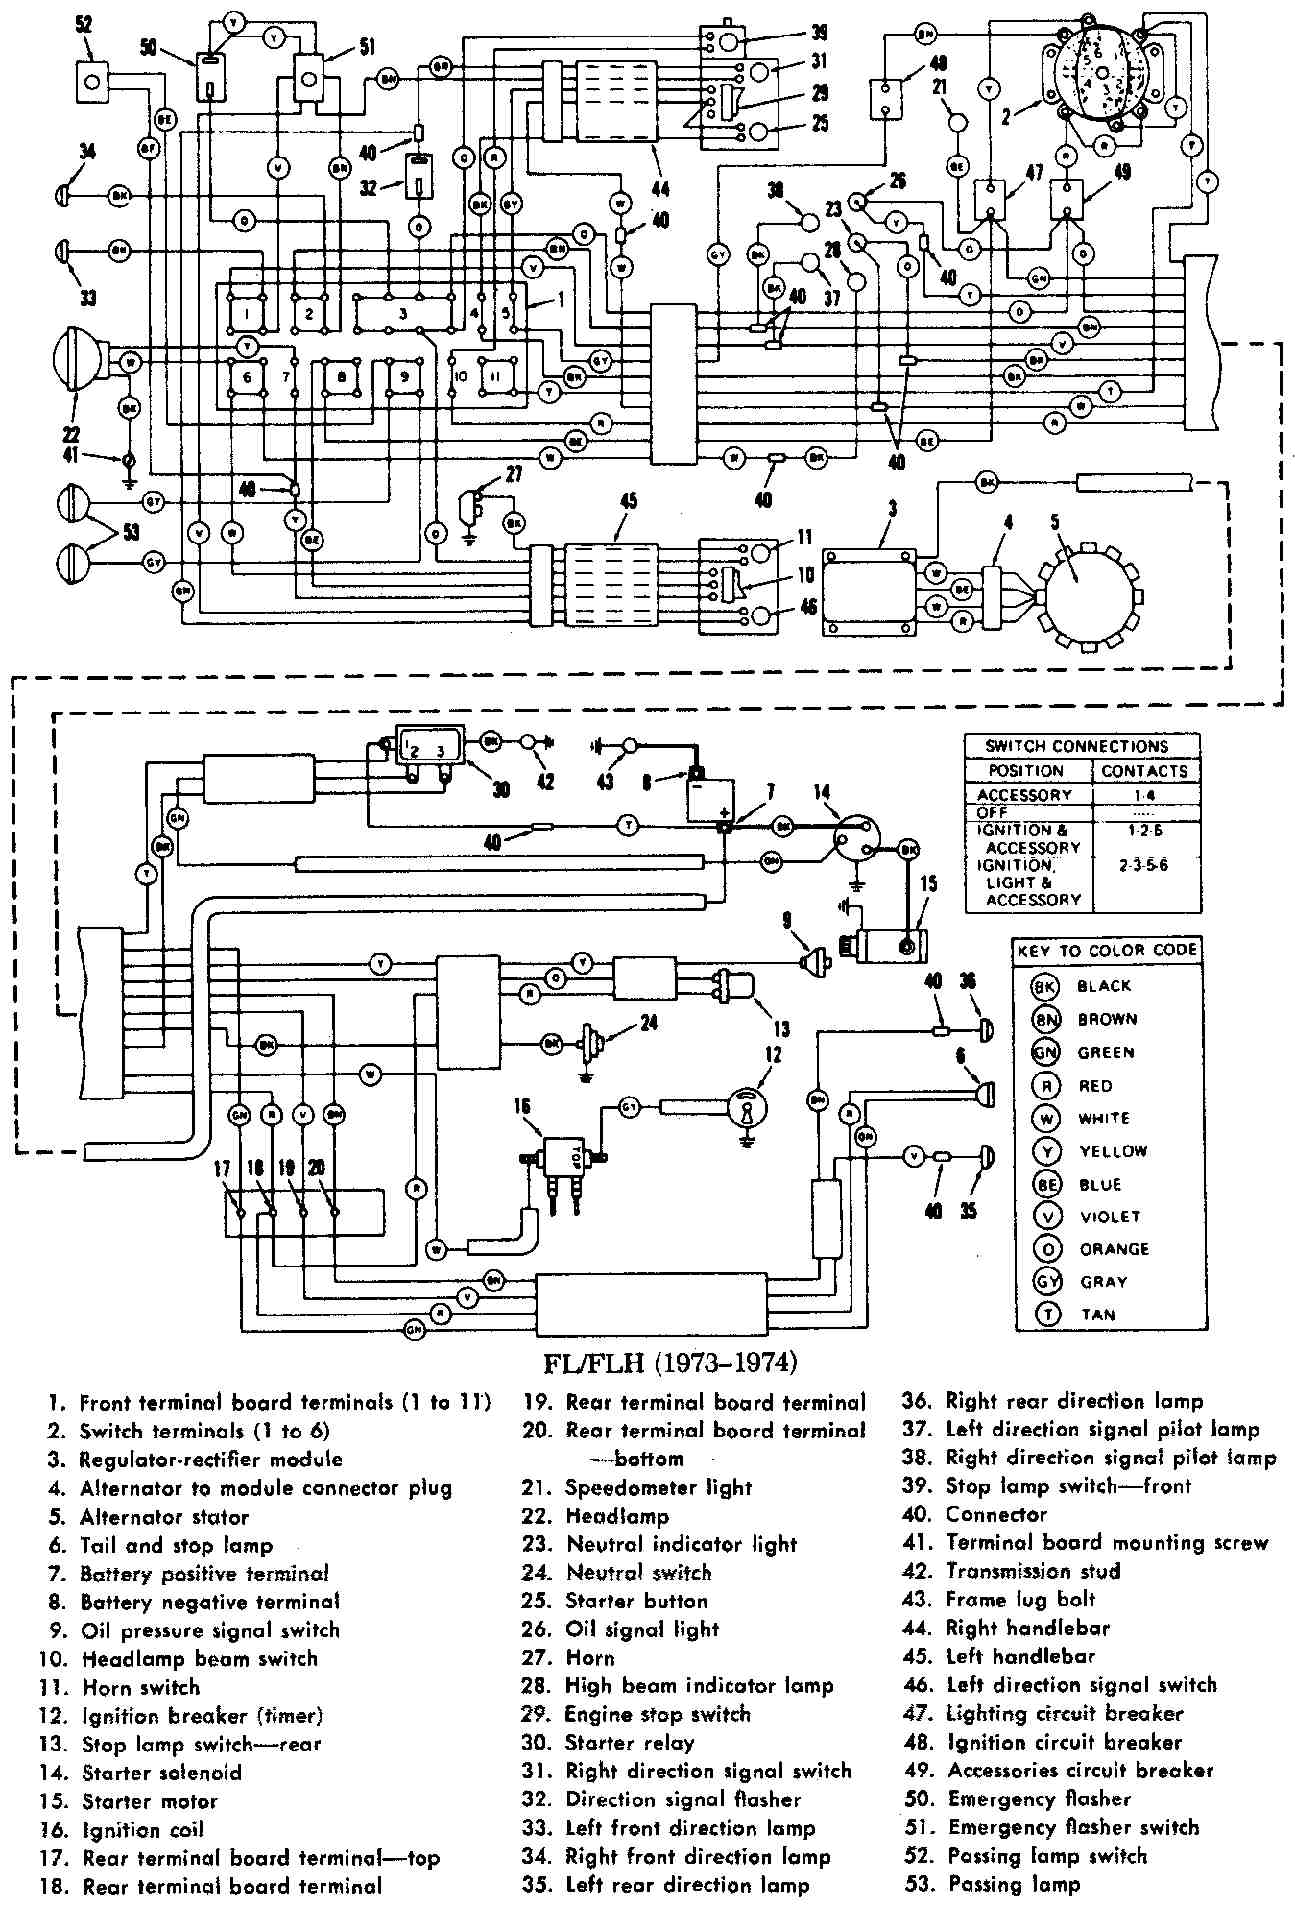 1972 Shovelhead Wiring Diagram 1980 Honda Cb750k Motorcycle Diagrams 81 Trusted Online81 Library Simple Harley